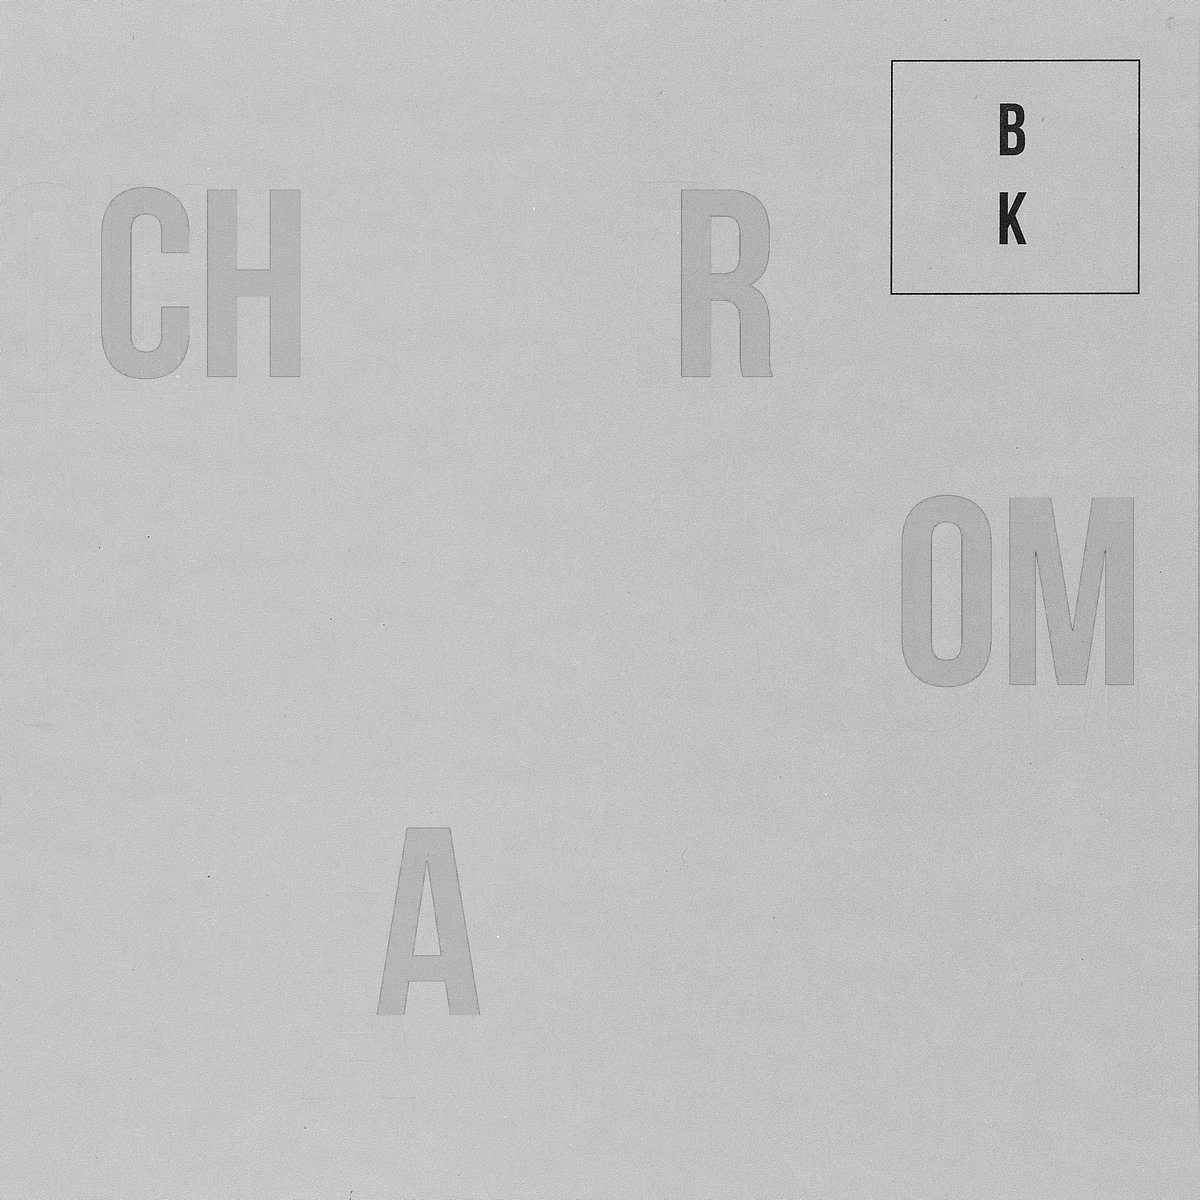 Buzz Kull - Chroma (LP; 2017)